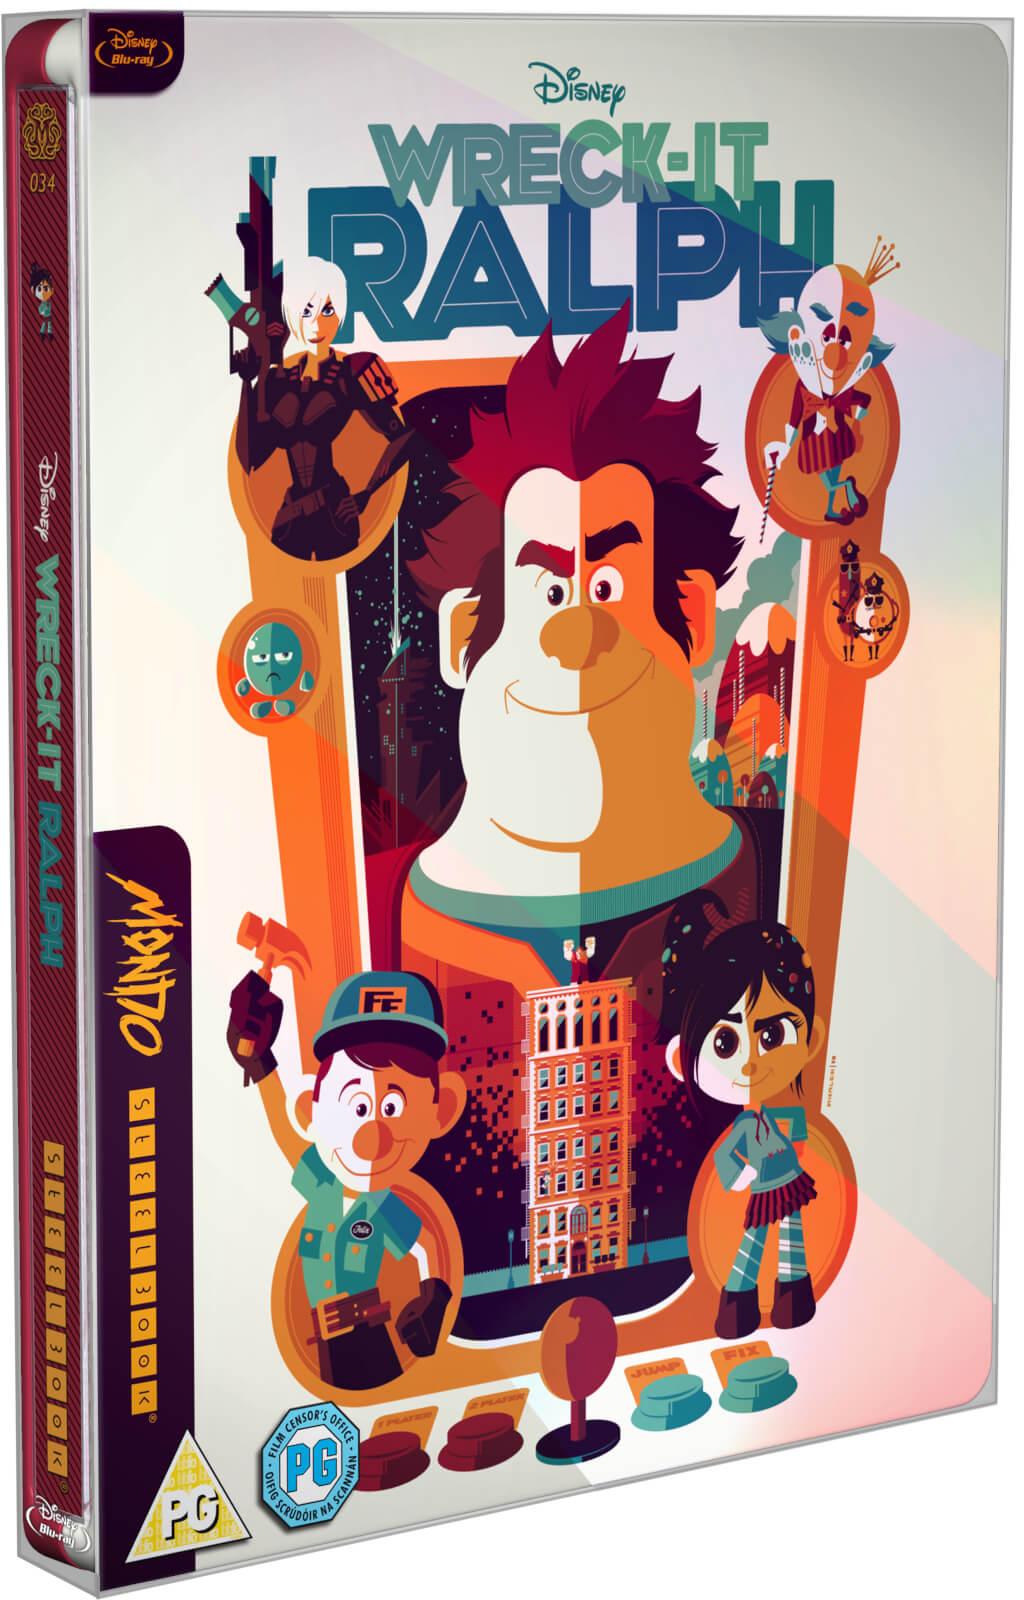 Wreck it Ralph - Mondo #34 Zavvi Exclusive Limited Edition Steelbook